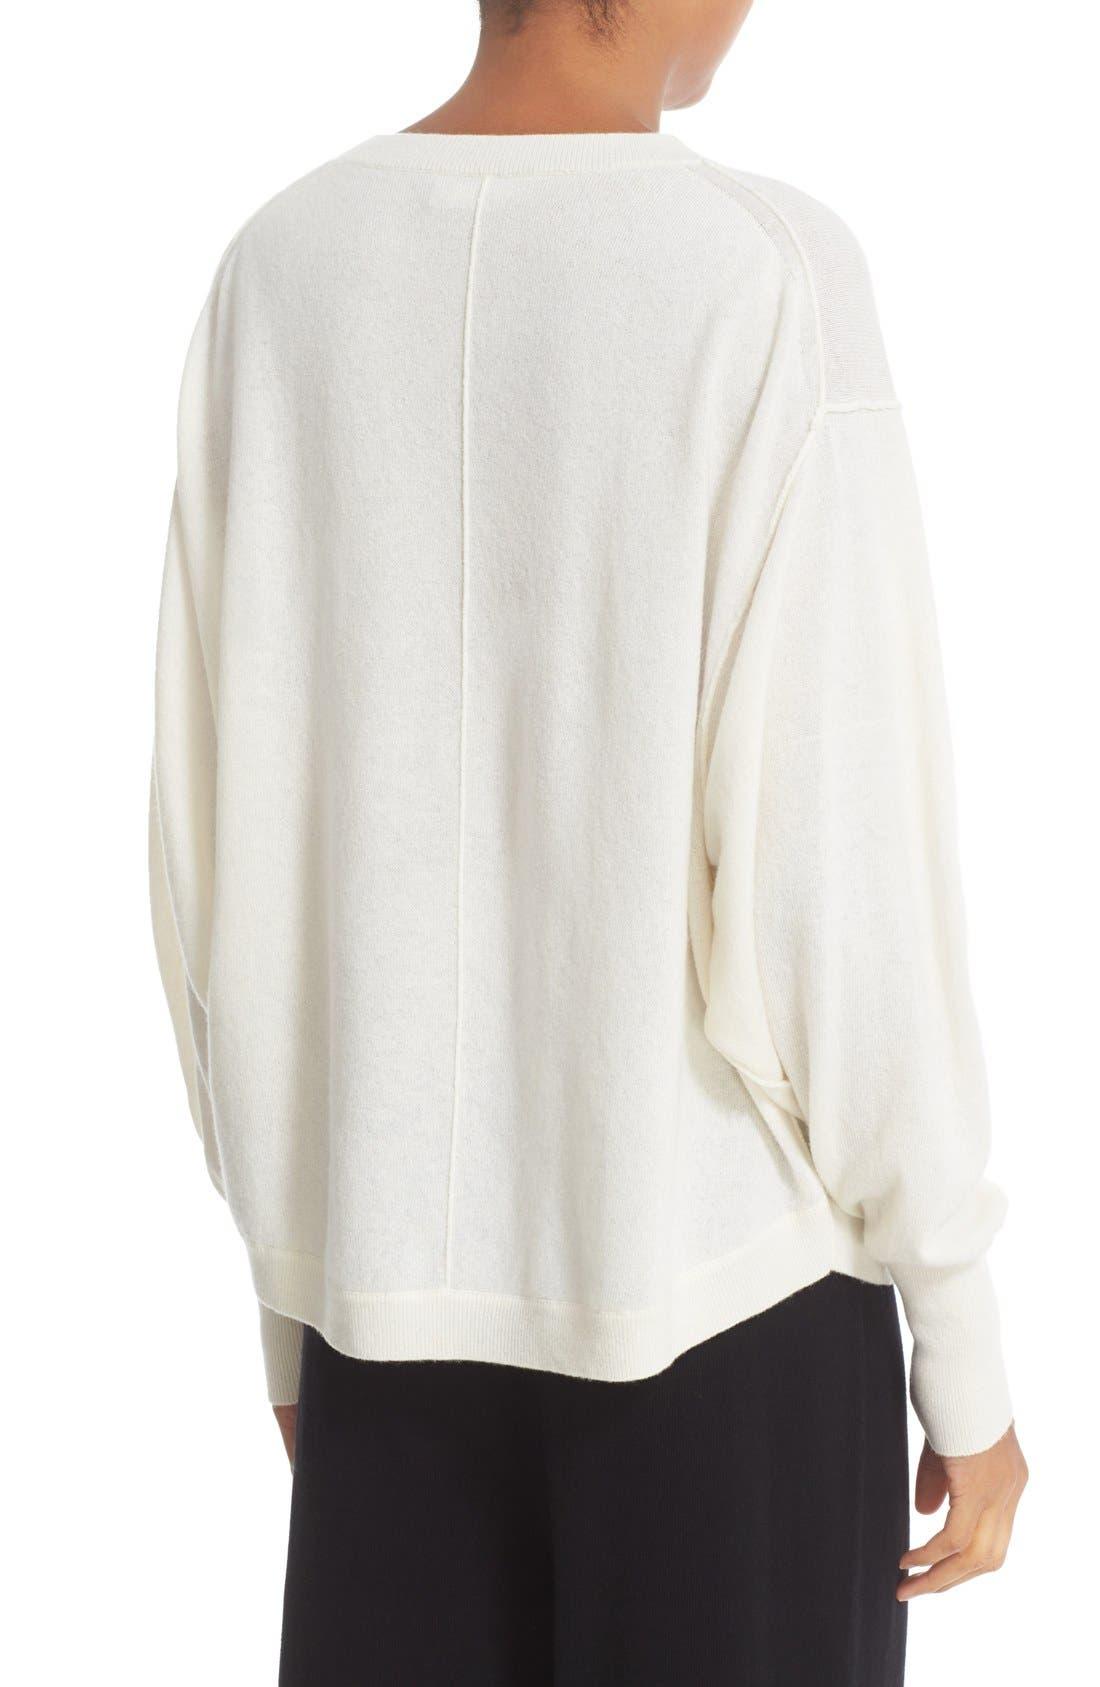 Shirttail Cashmere Sweater,                             Alternate thumbnail 2, color,                             101